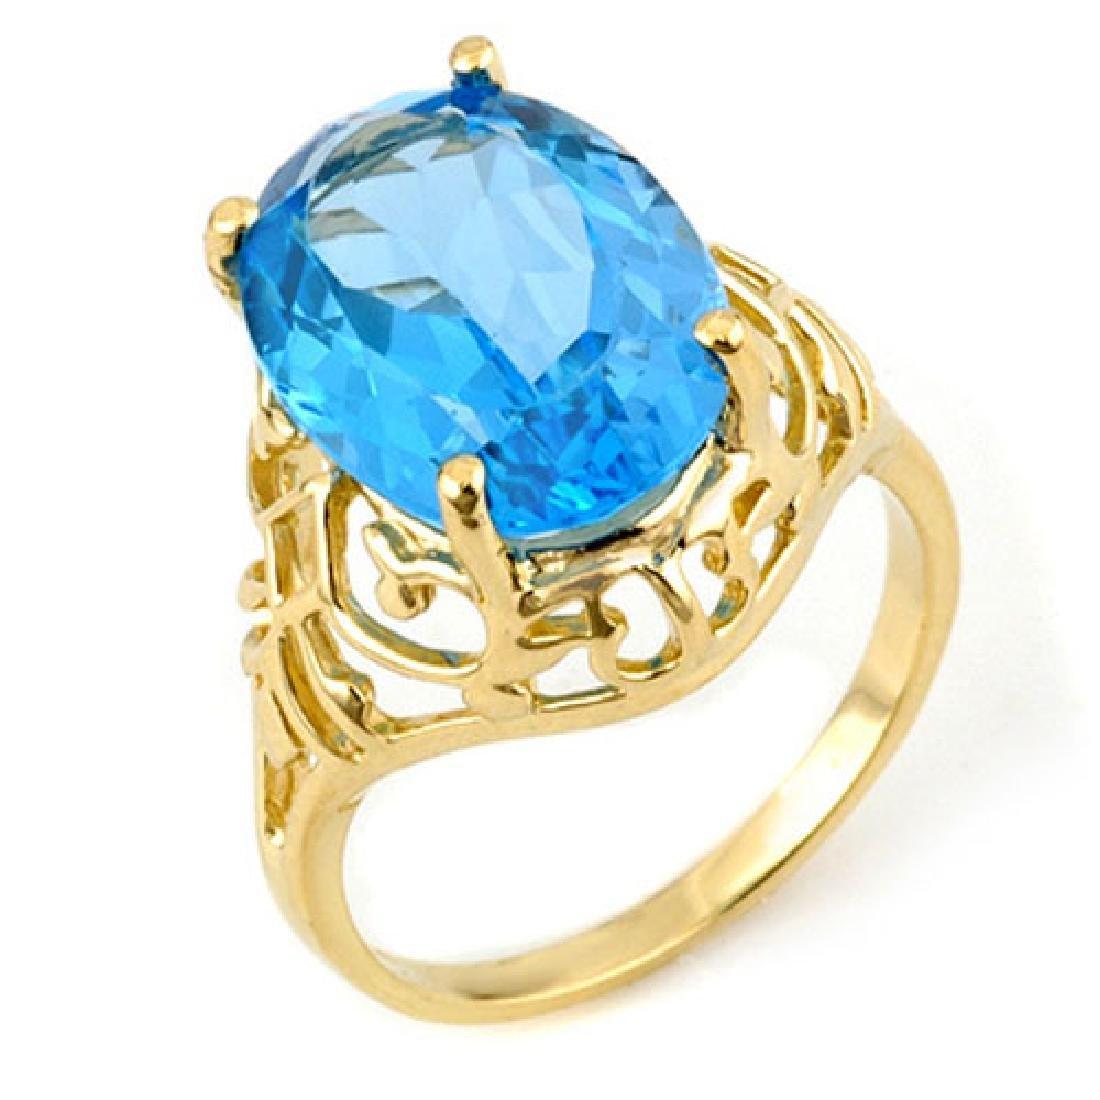 8.0 CTW Blue Topaz Ring 10K Yellow Gold